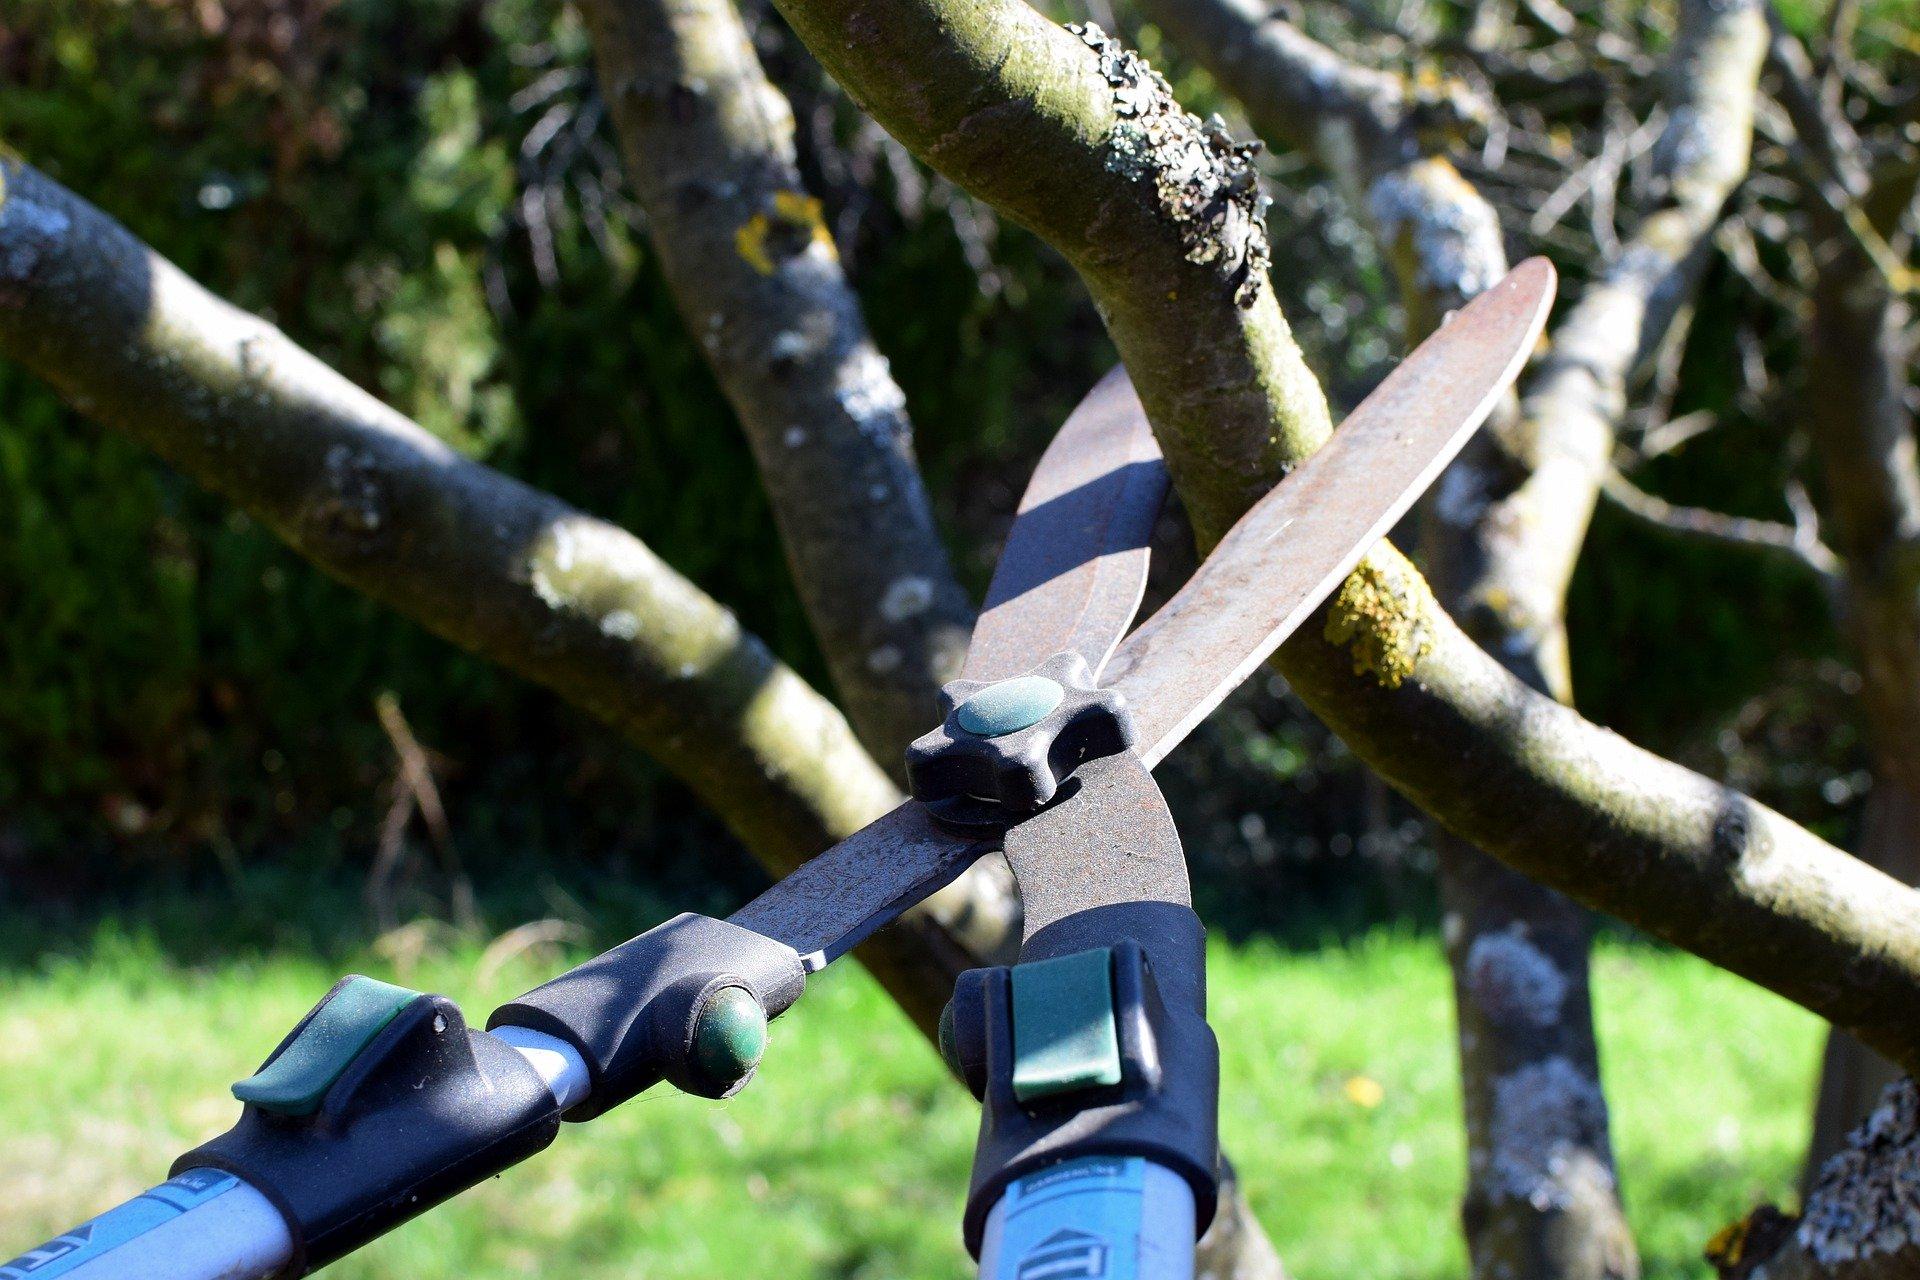 pruning-shears-pruning-tree-branch.jpg